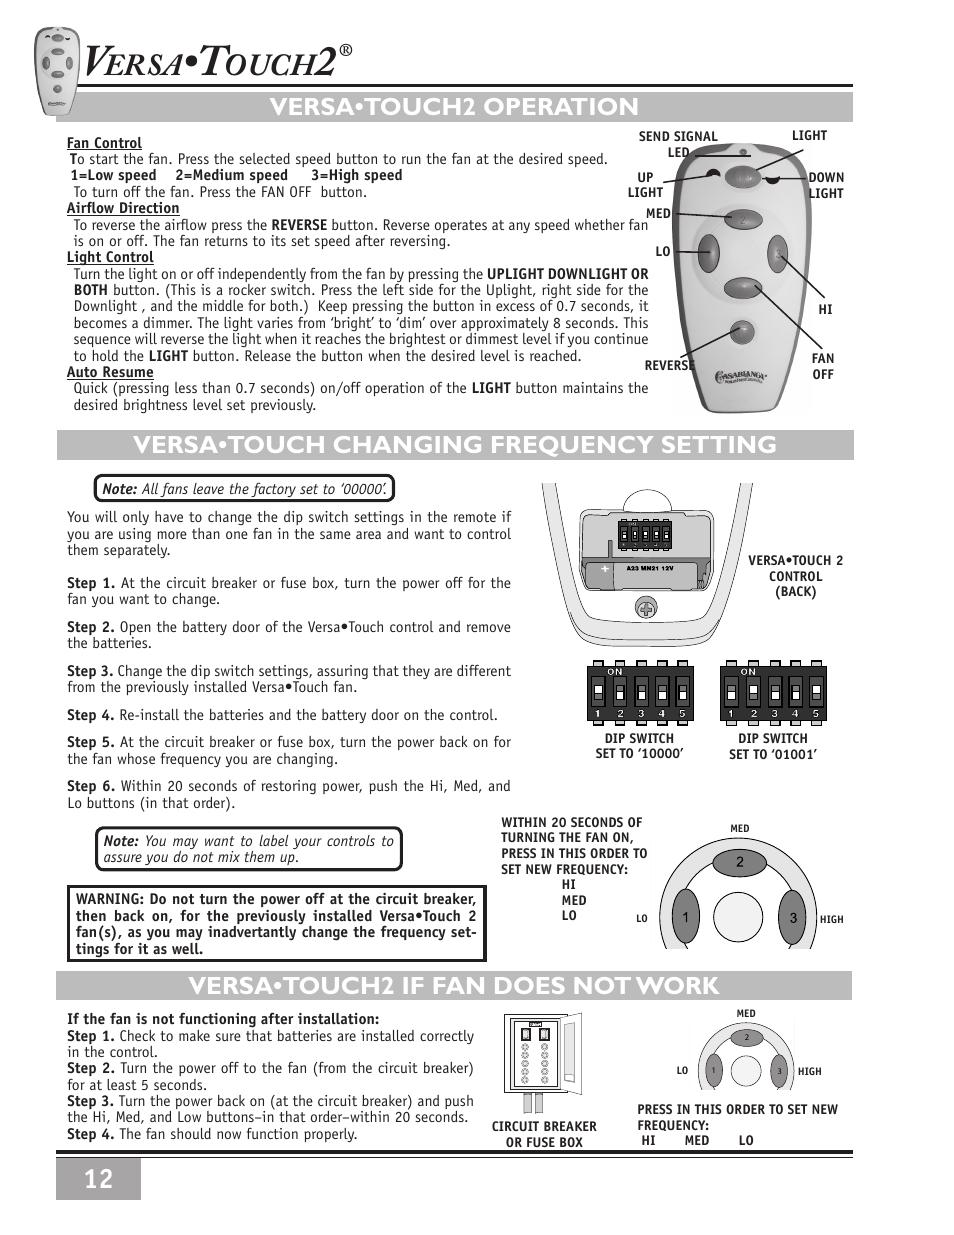 Casablanca 3 Sd Fan Wiring Diagram Panasonic Diagrams Ceiling Manual Decorating Ideas On Coleman For Harbor Breeze